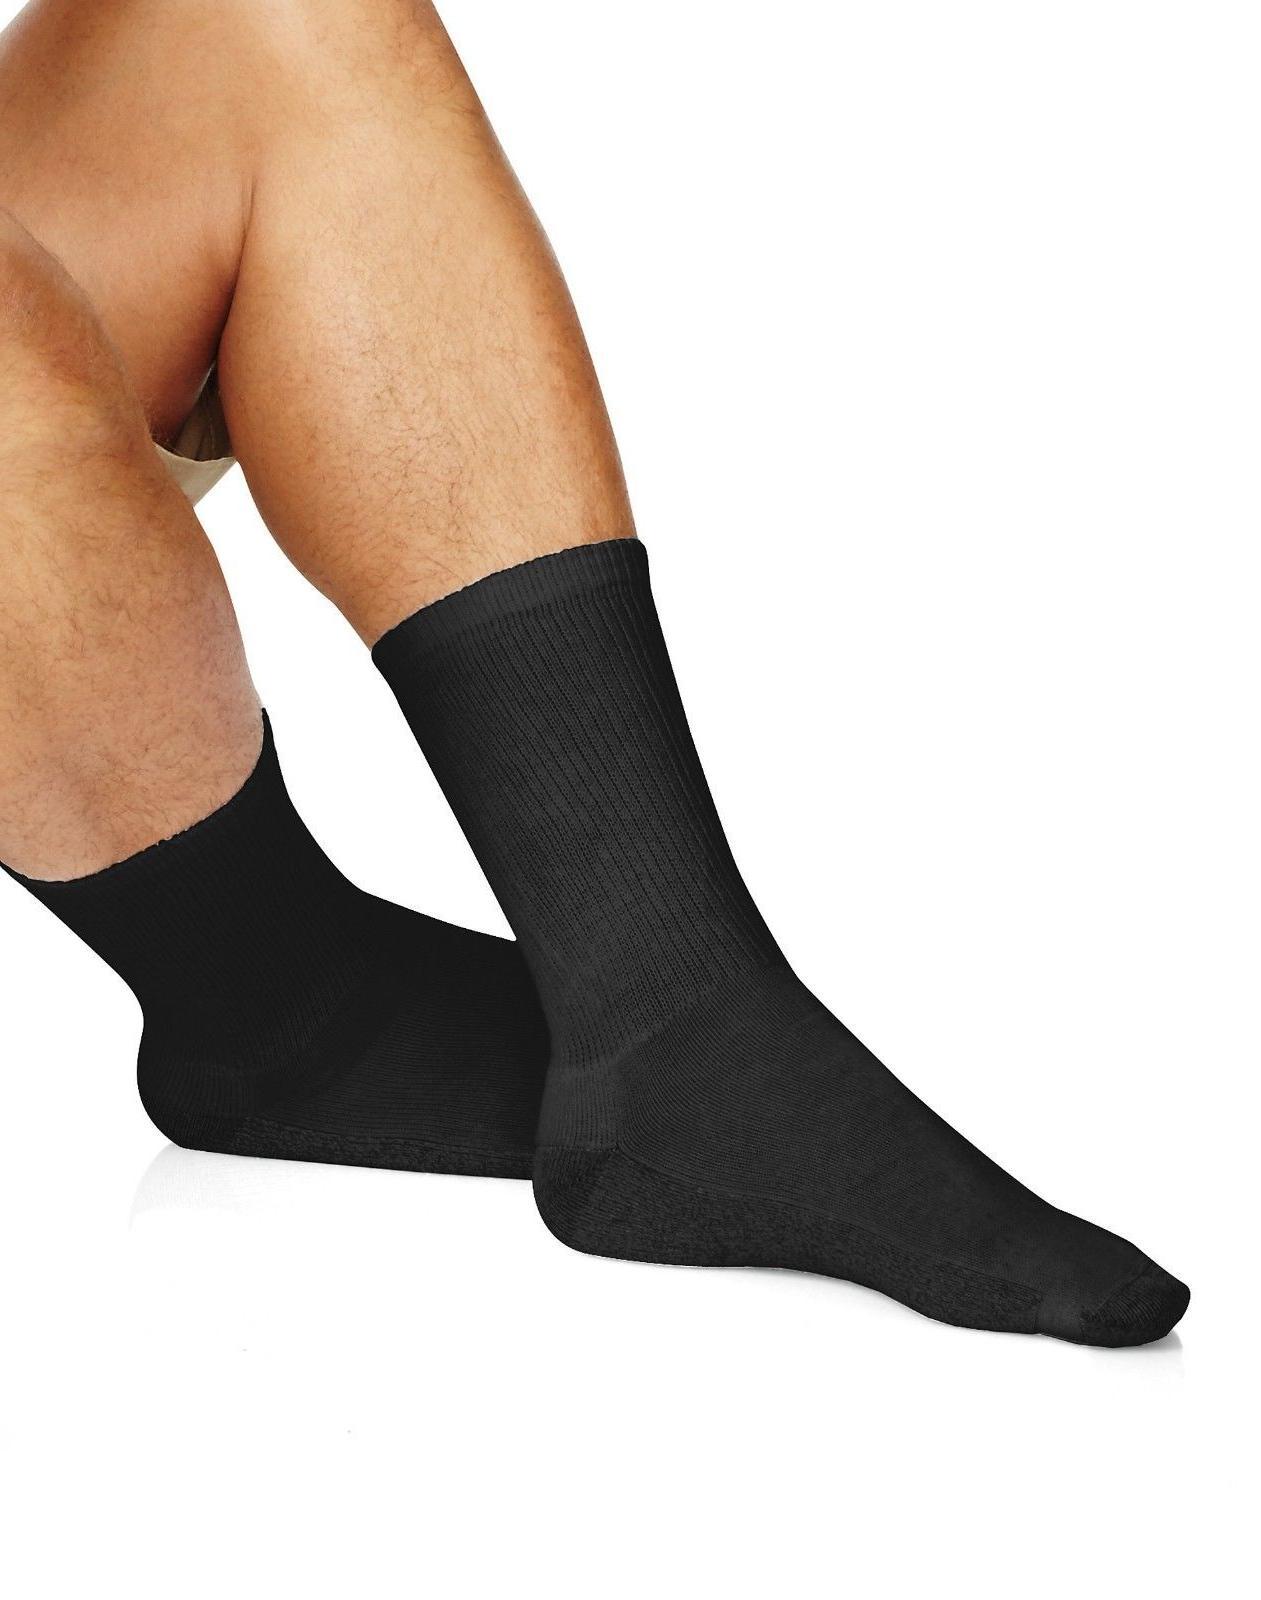 Hanes Crew White Comfort Sock Size Shoe Size 6-12